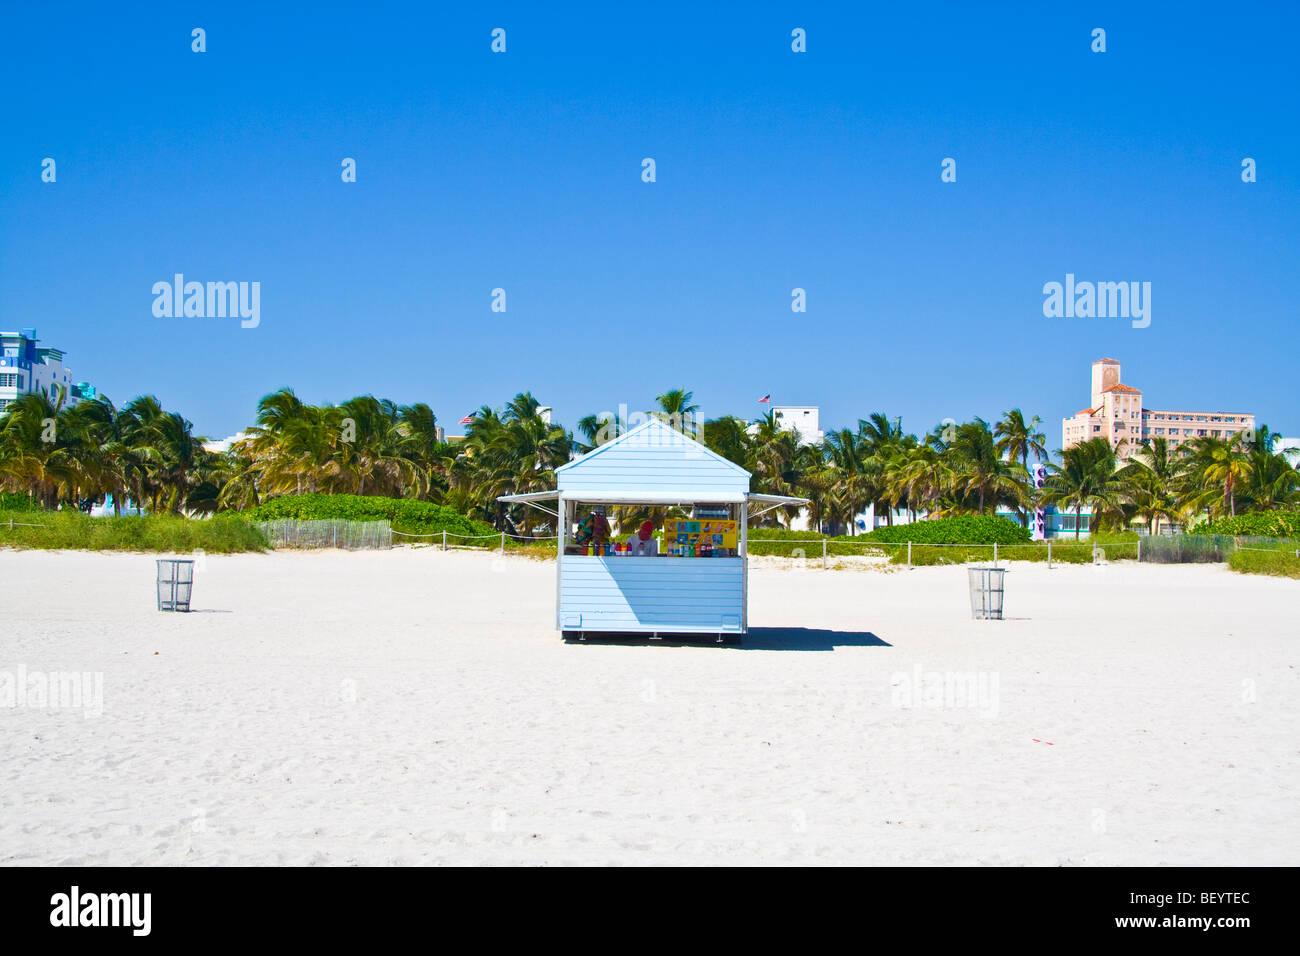 Beach hut shop miami beach south beach miami florida usa. Ocean drive in the background, palm trees blue sky - Stock Image